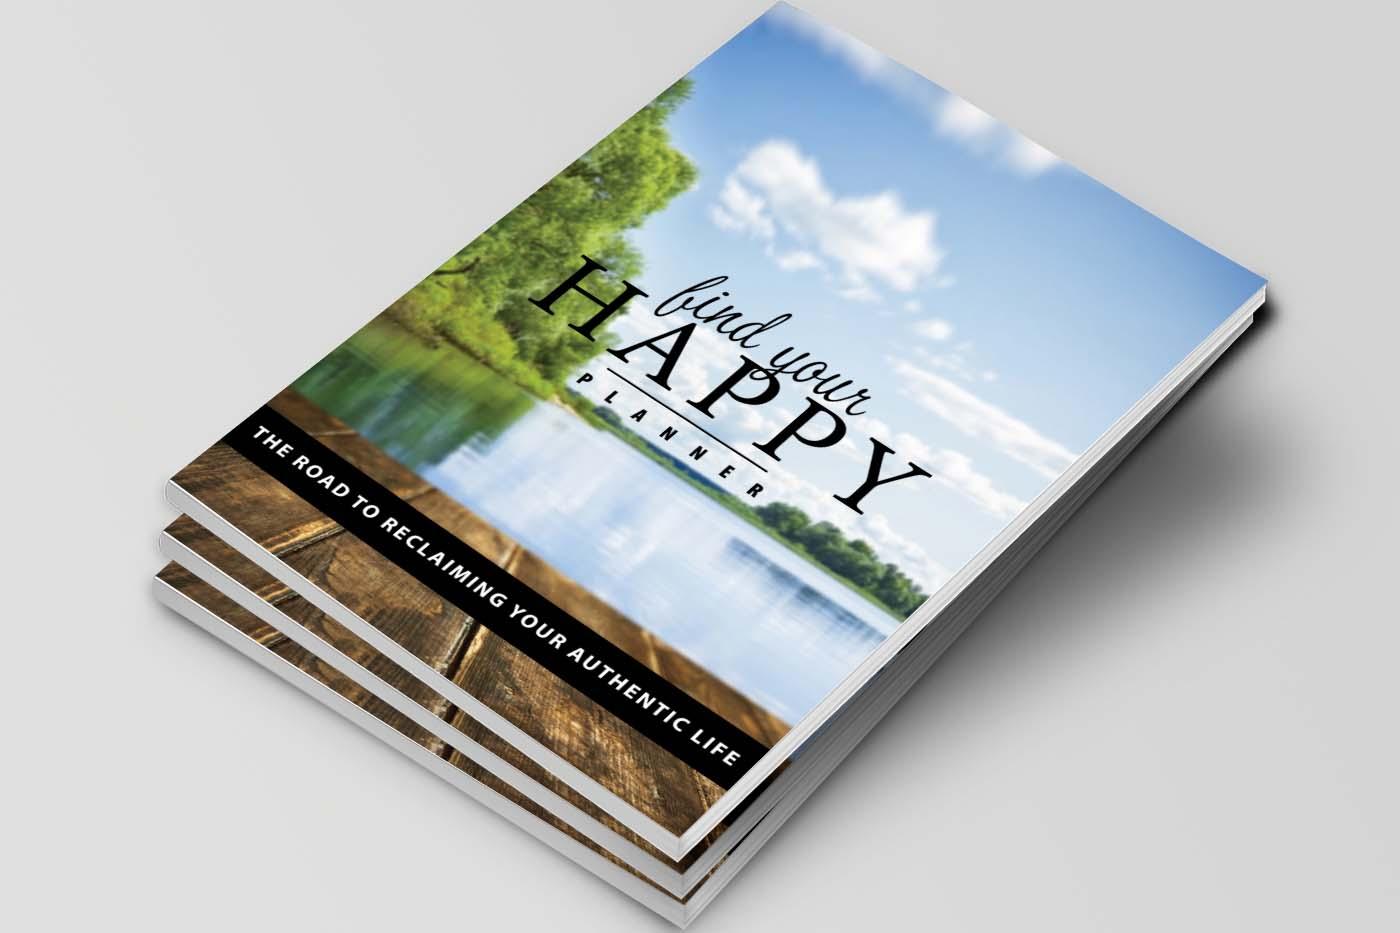 Rhonda-Zarate-Find-Your-Happy-Planner-Design-stack-of-planners.jpg